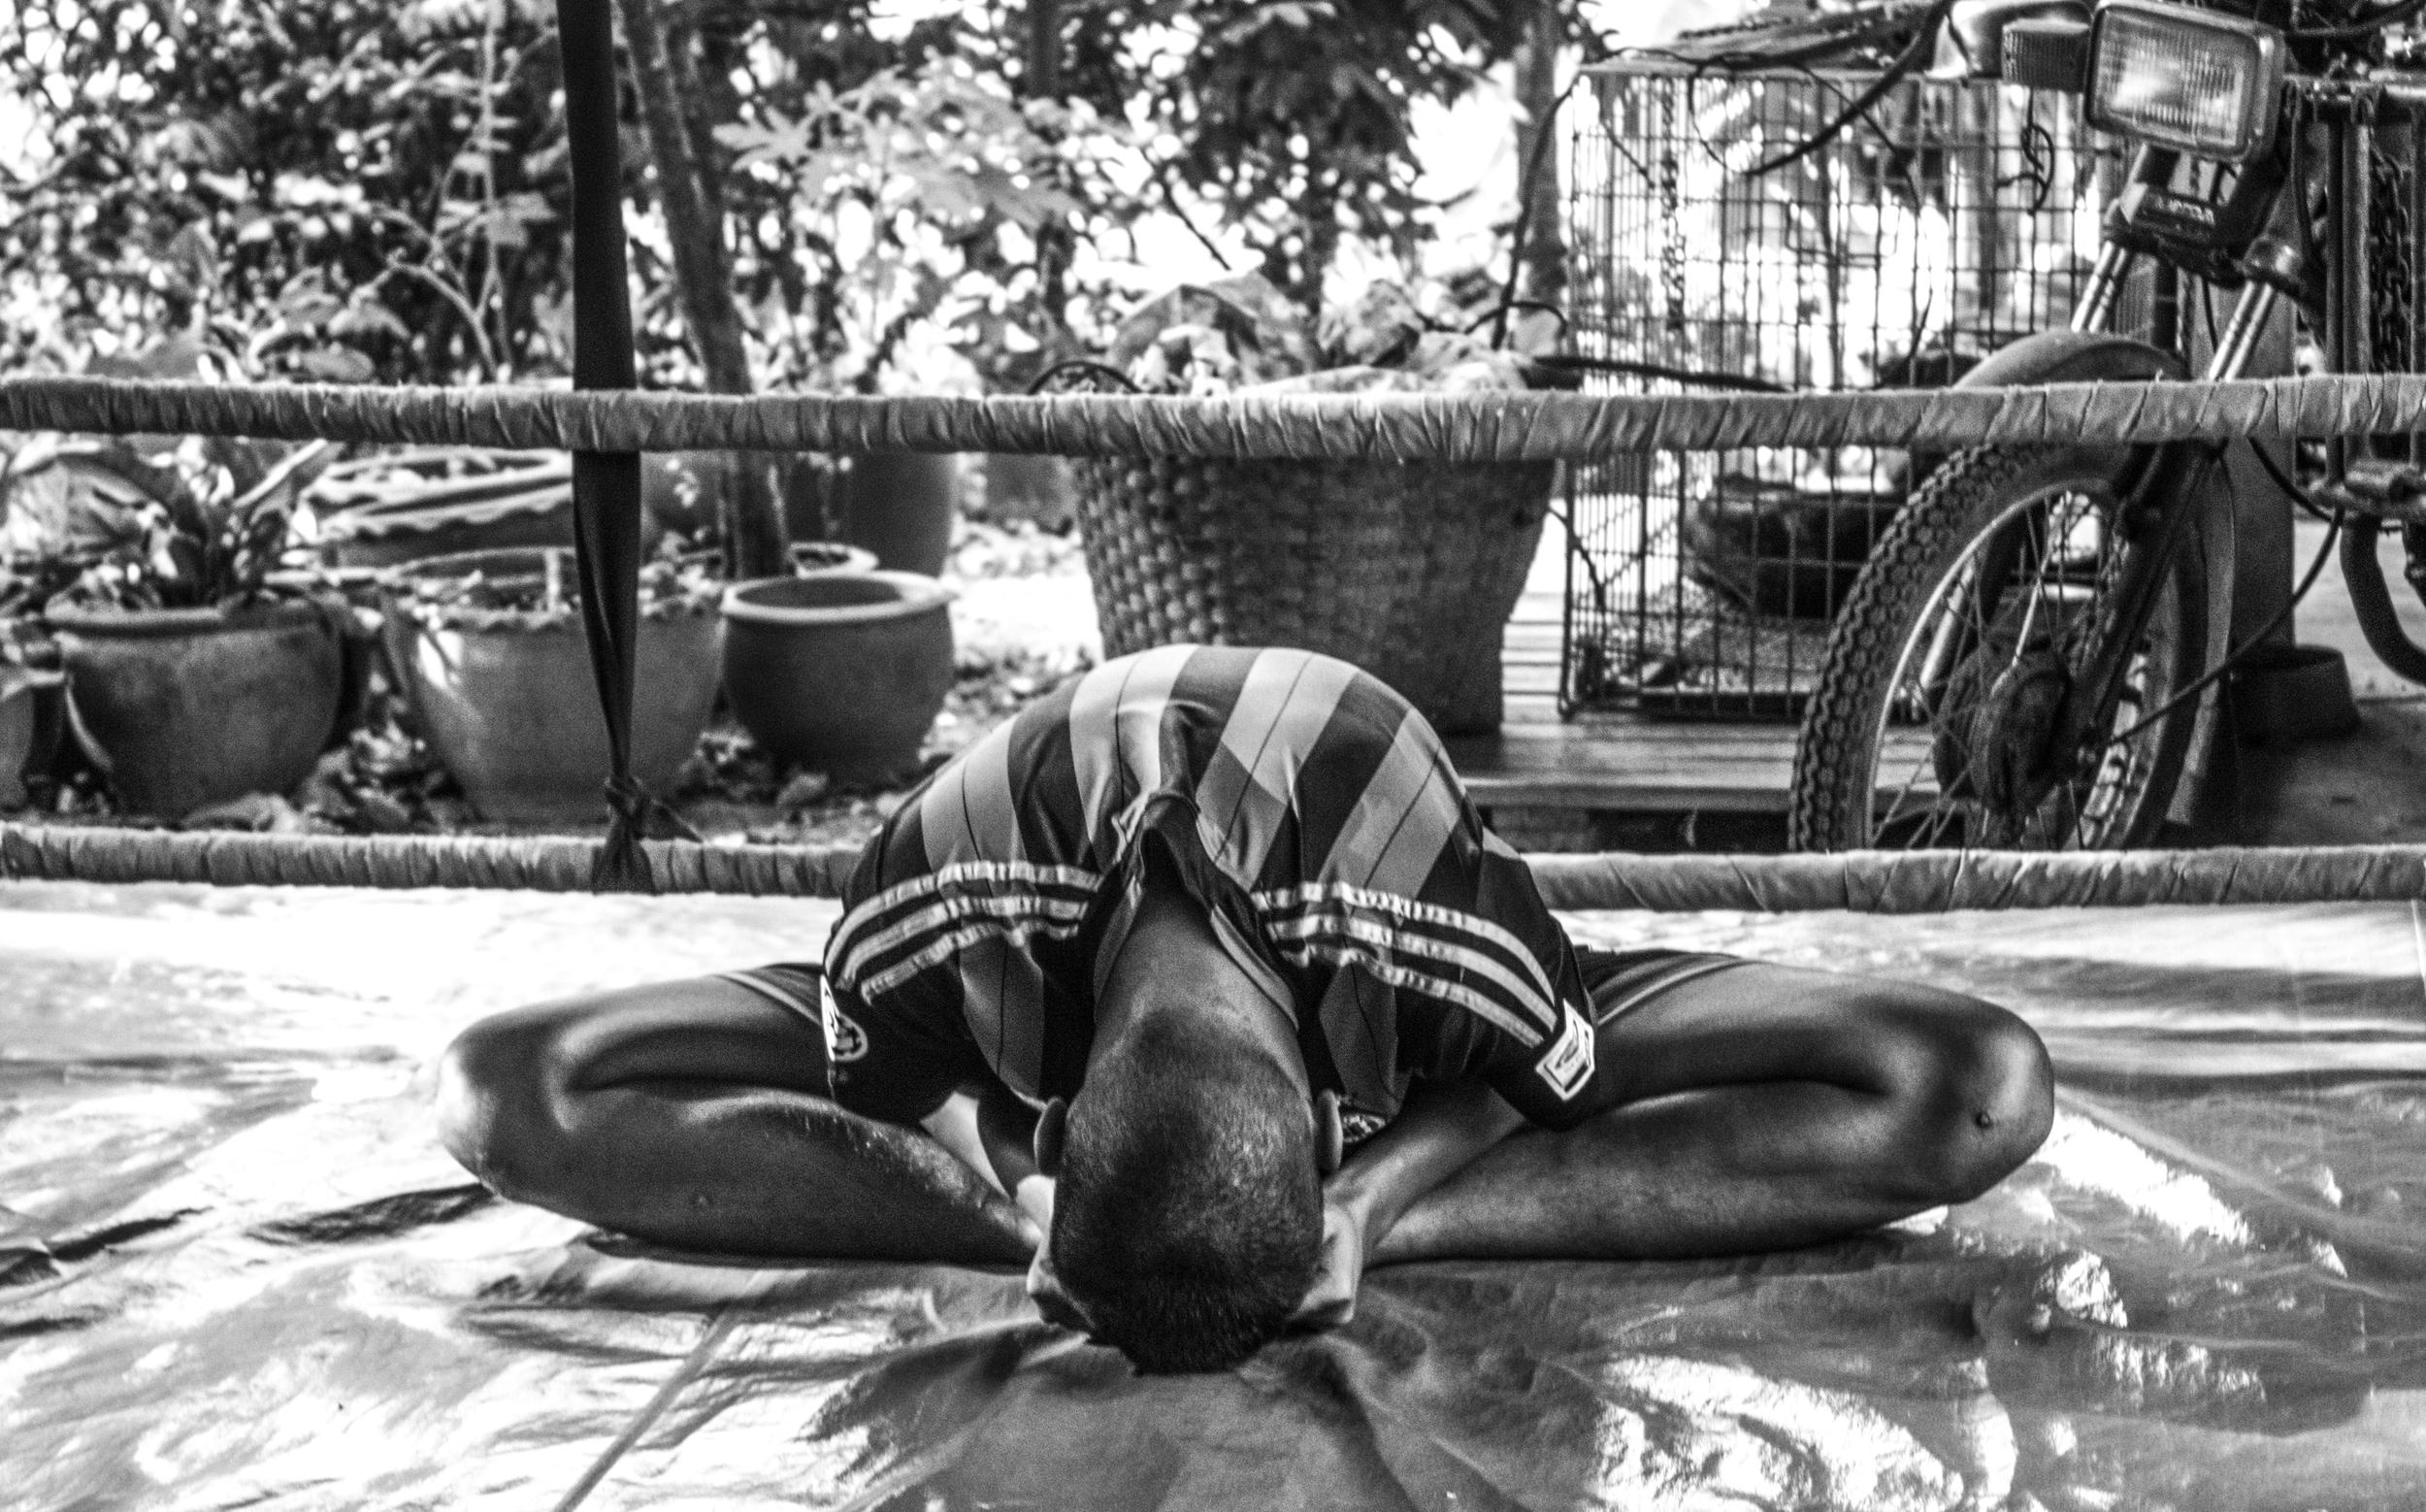 Ring Prayers (August 3, 2014 - Nakhon Si Thammarat, Thailand)